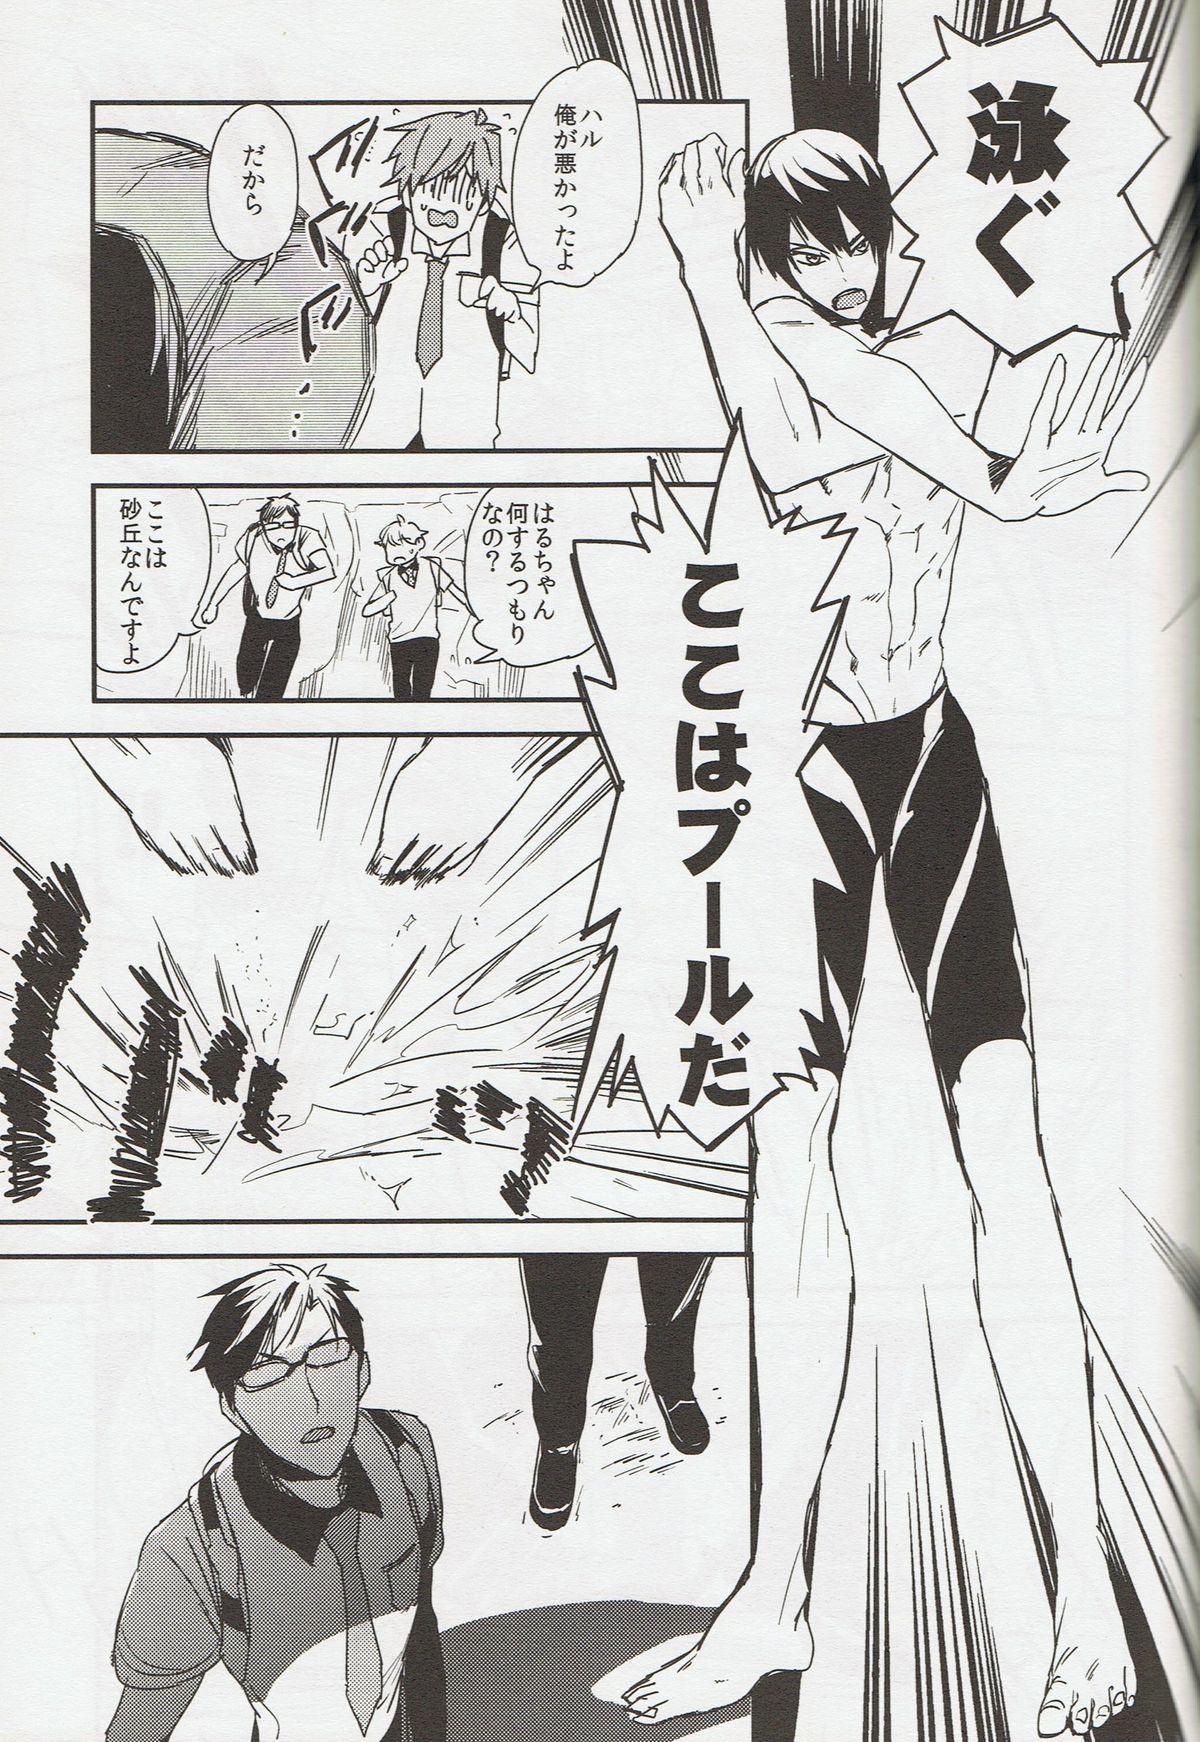 Sou da, Tottori Sakyuu Ikou. 31